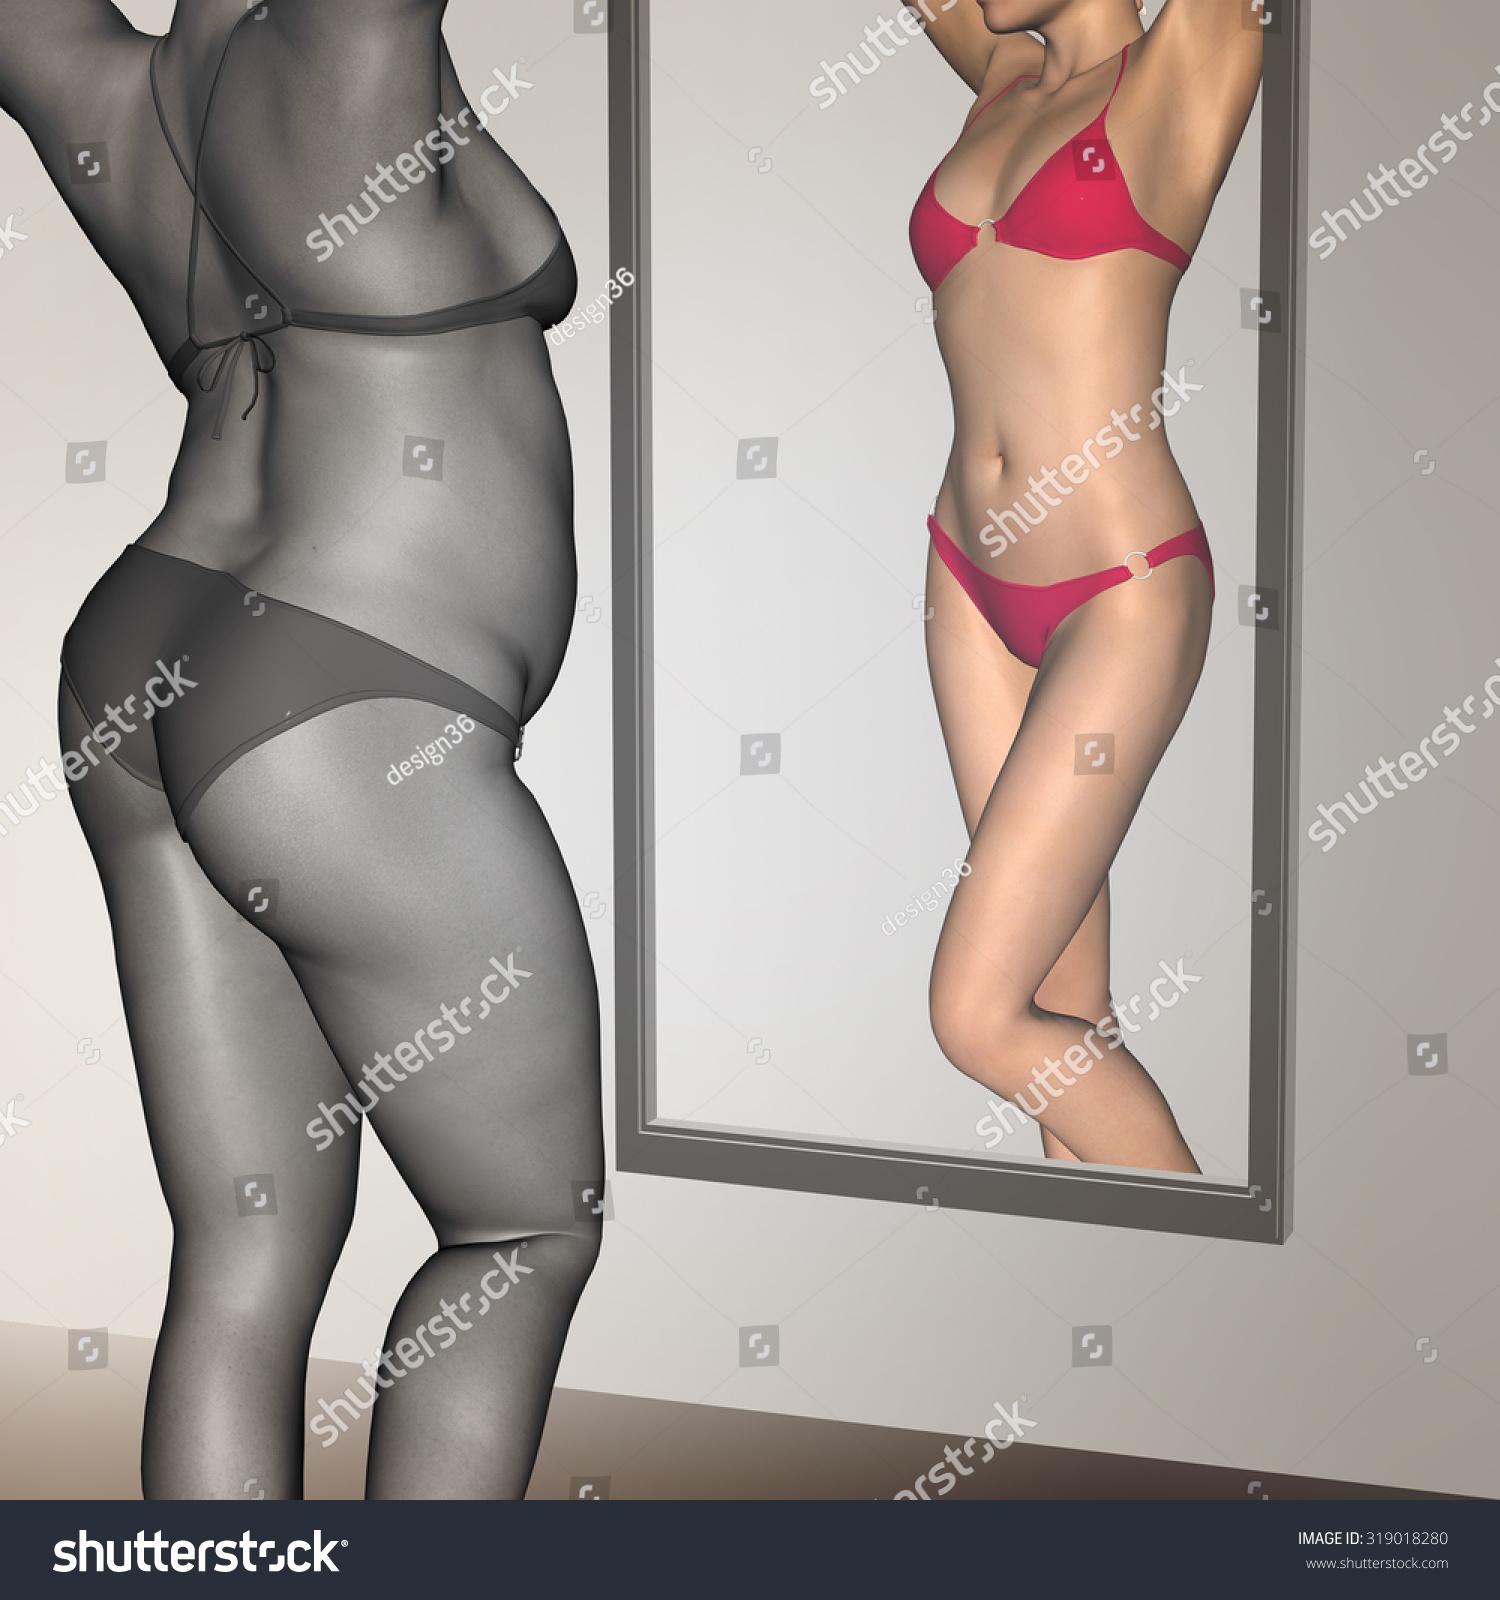 Vista previa gratuita de mujer gorda desnuda